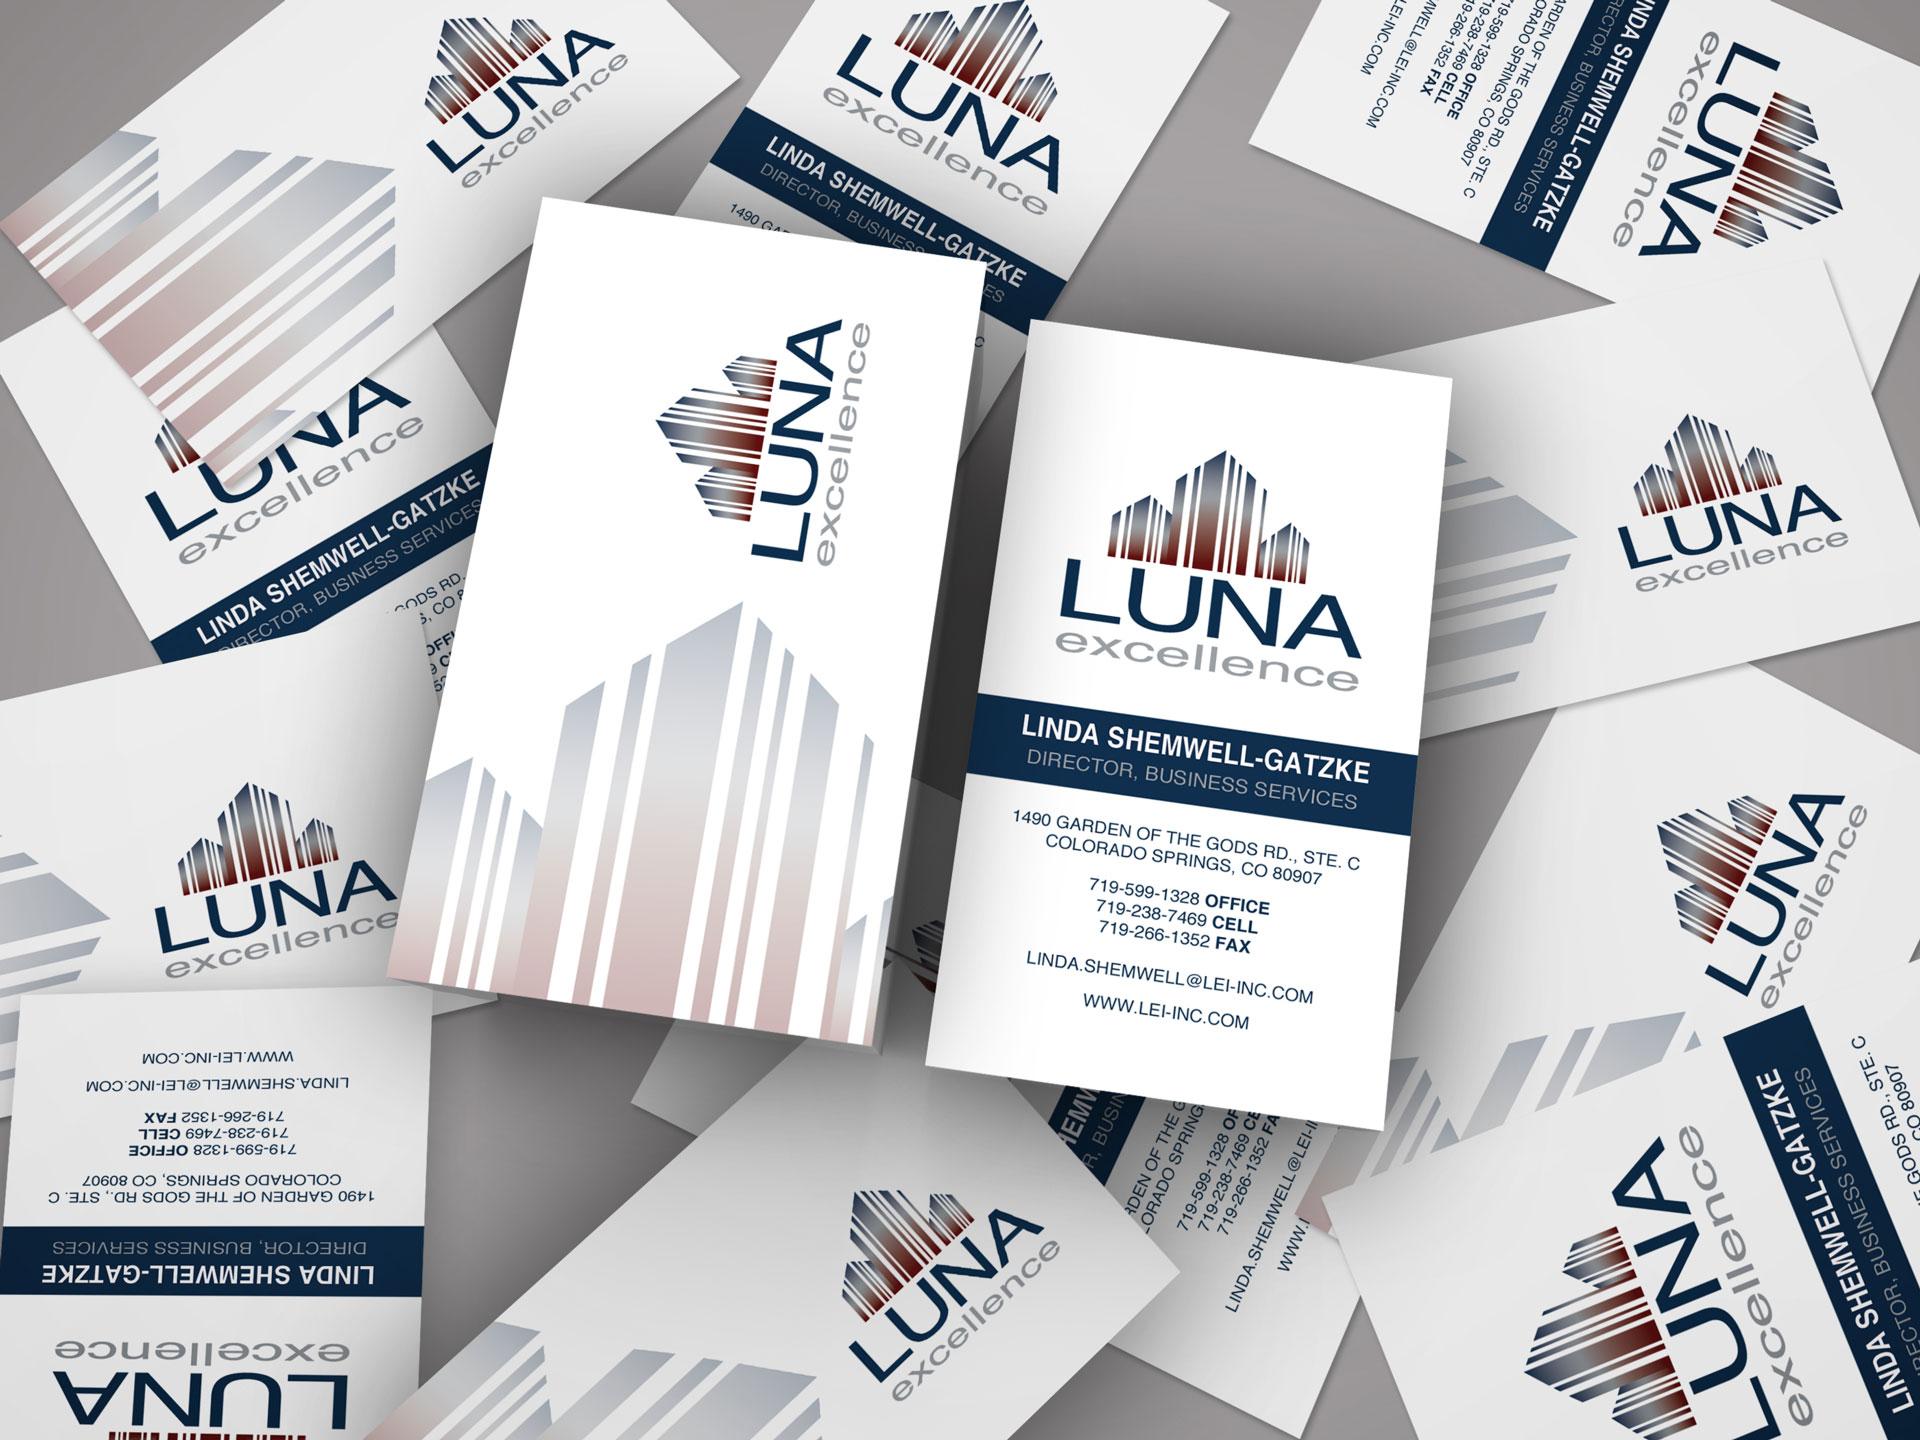 Business card design for Luna Excellence Inc.